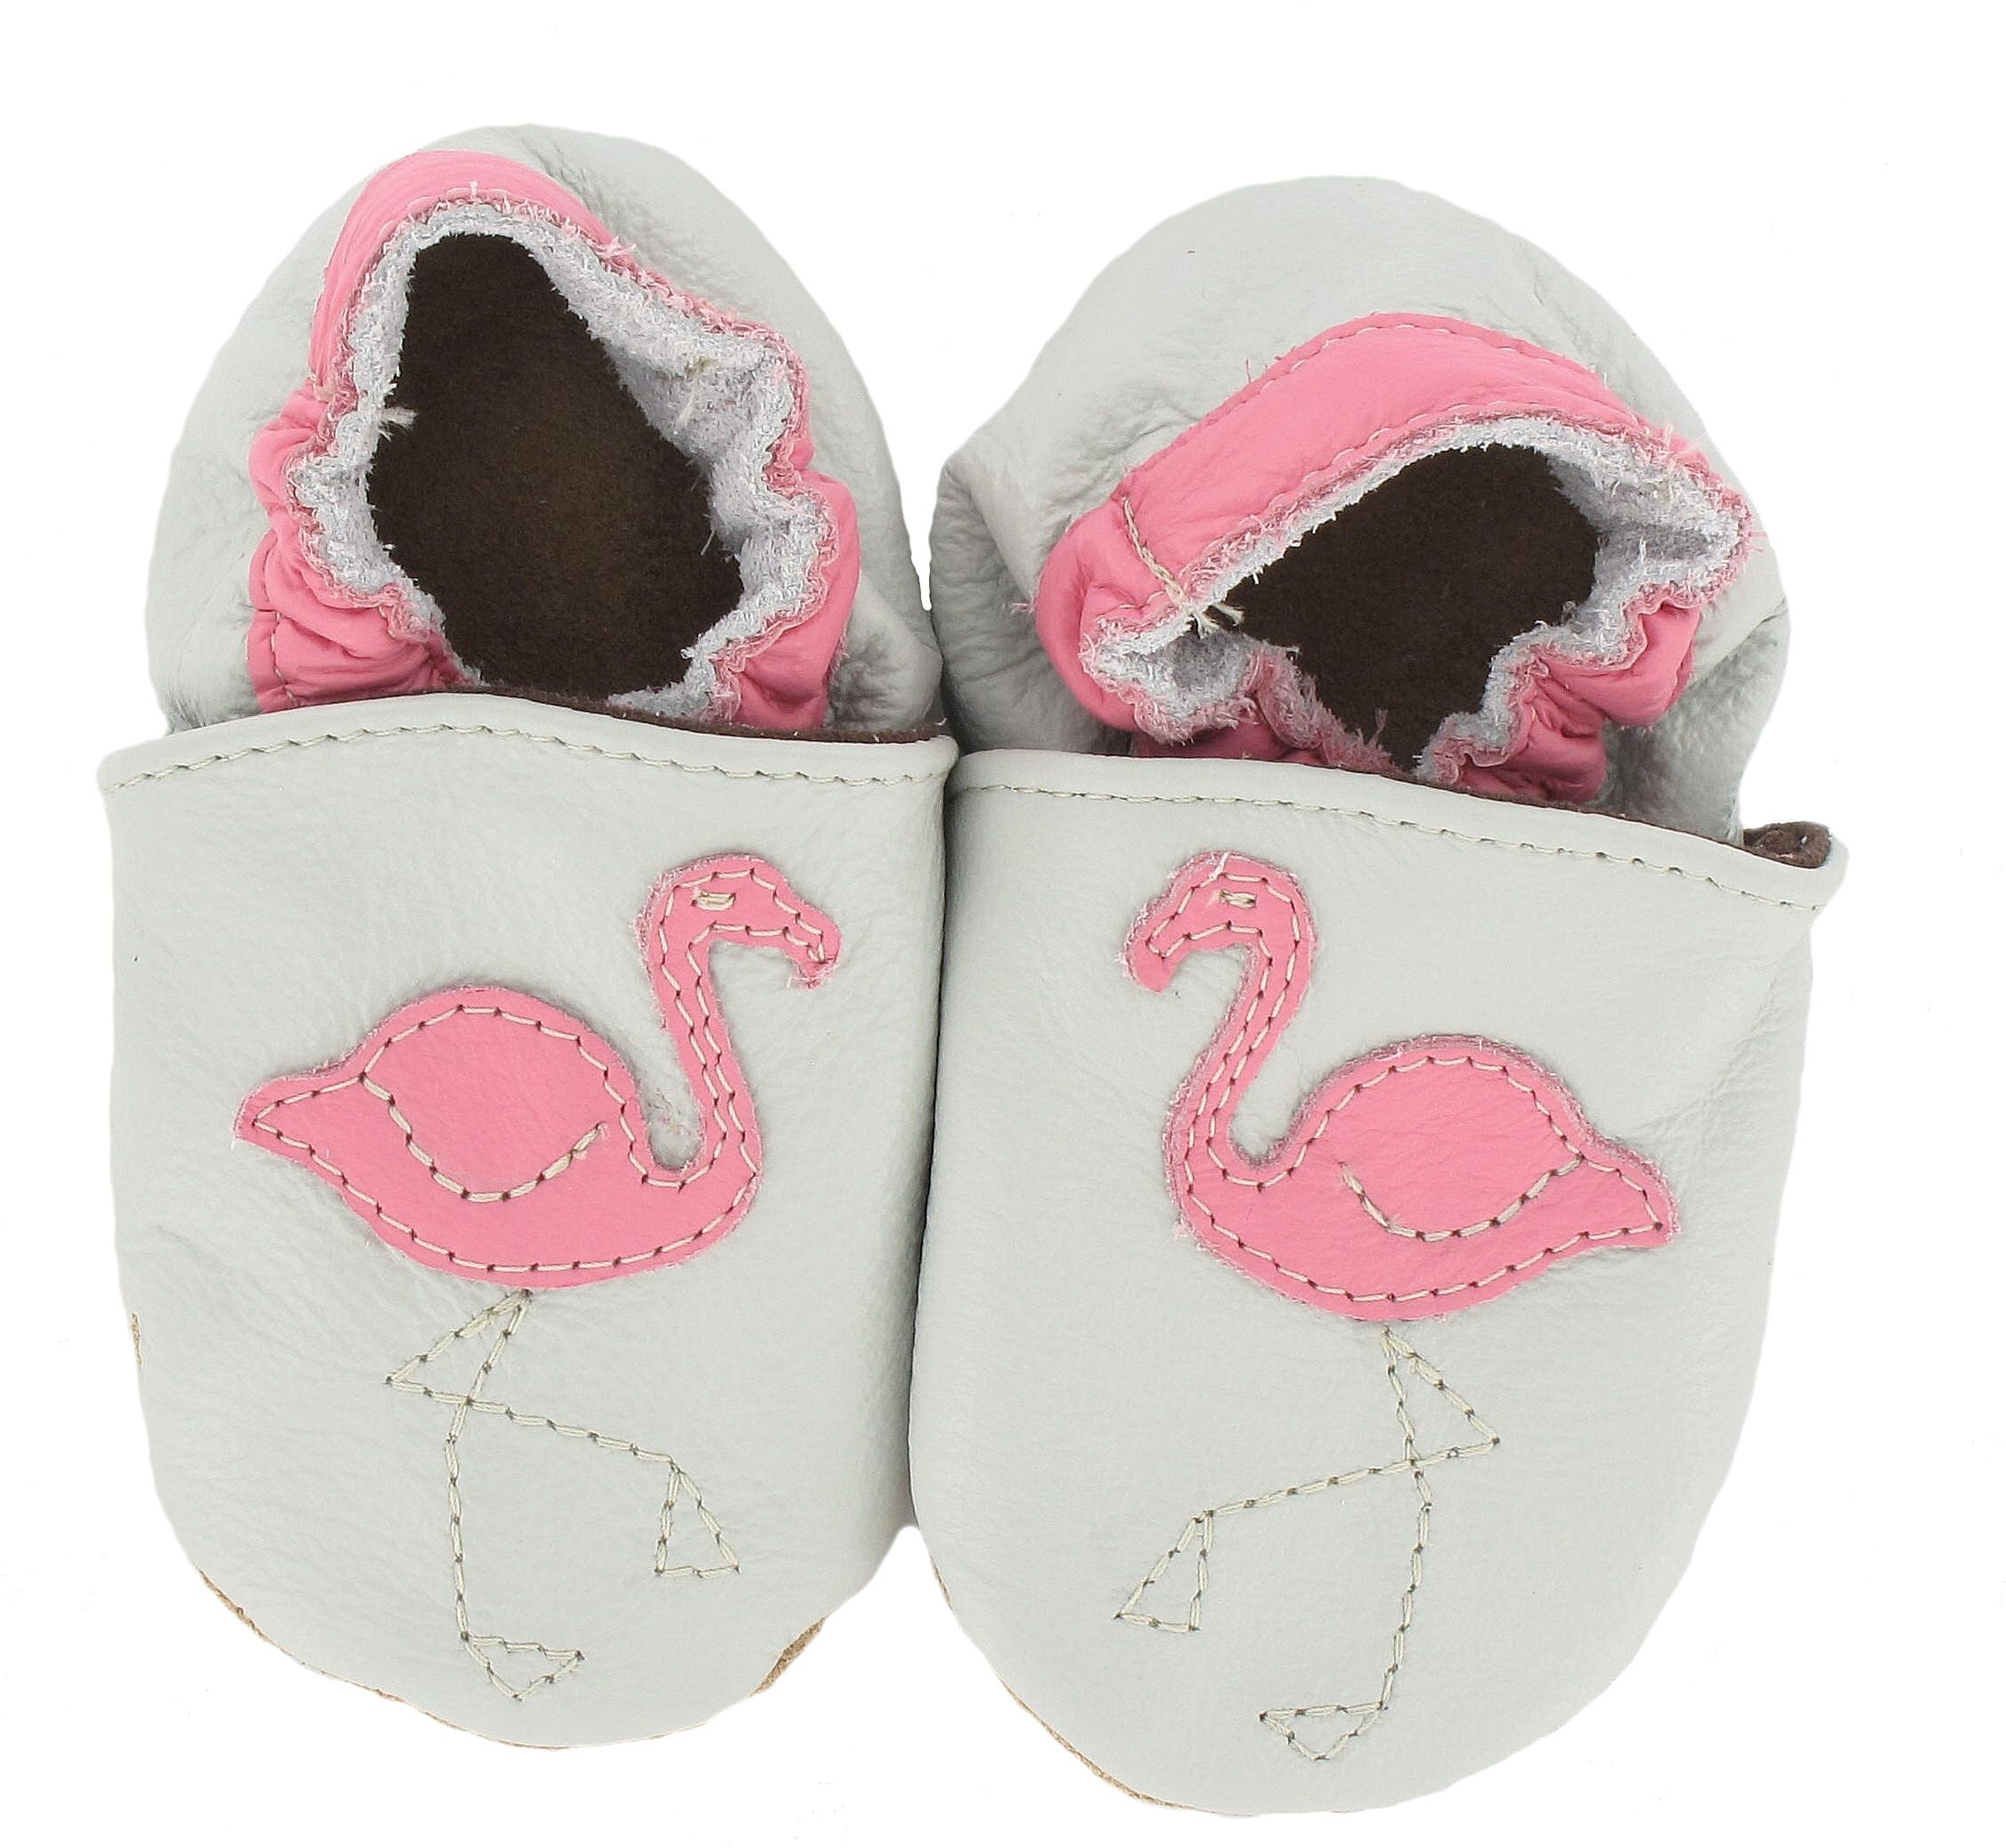 Pololo Baby Schuhe Leder Lauflernschuhe Krabbelschuhe Hauschuhe Babyschuhe neu